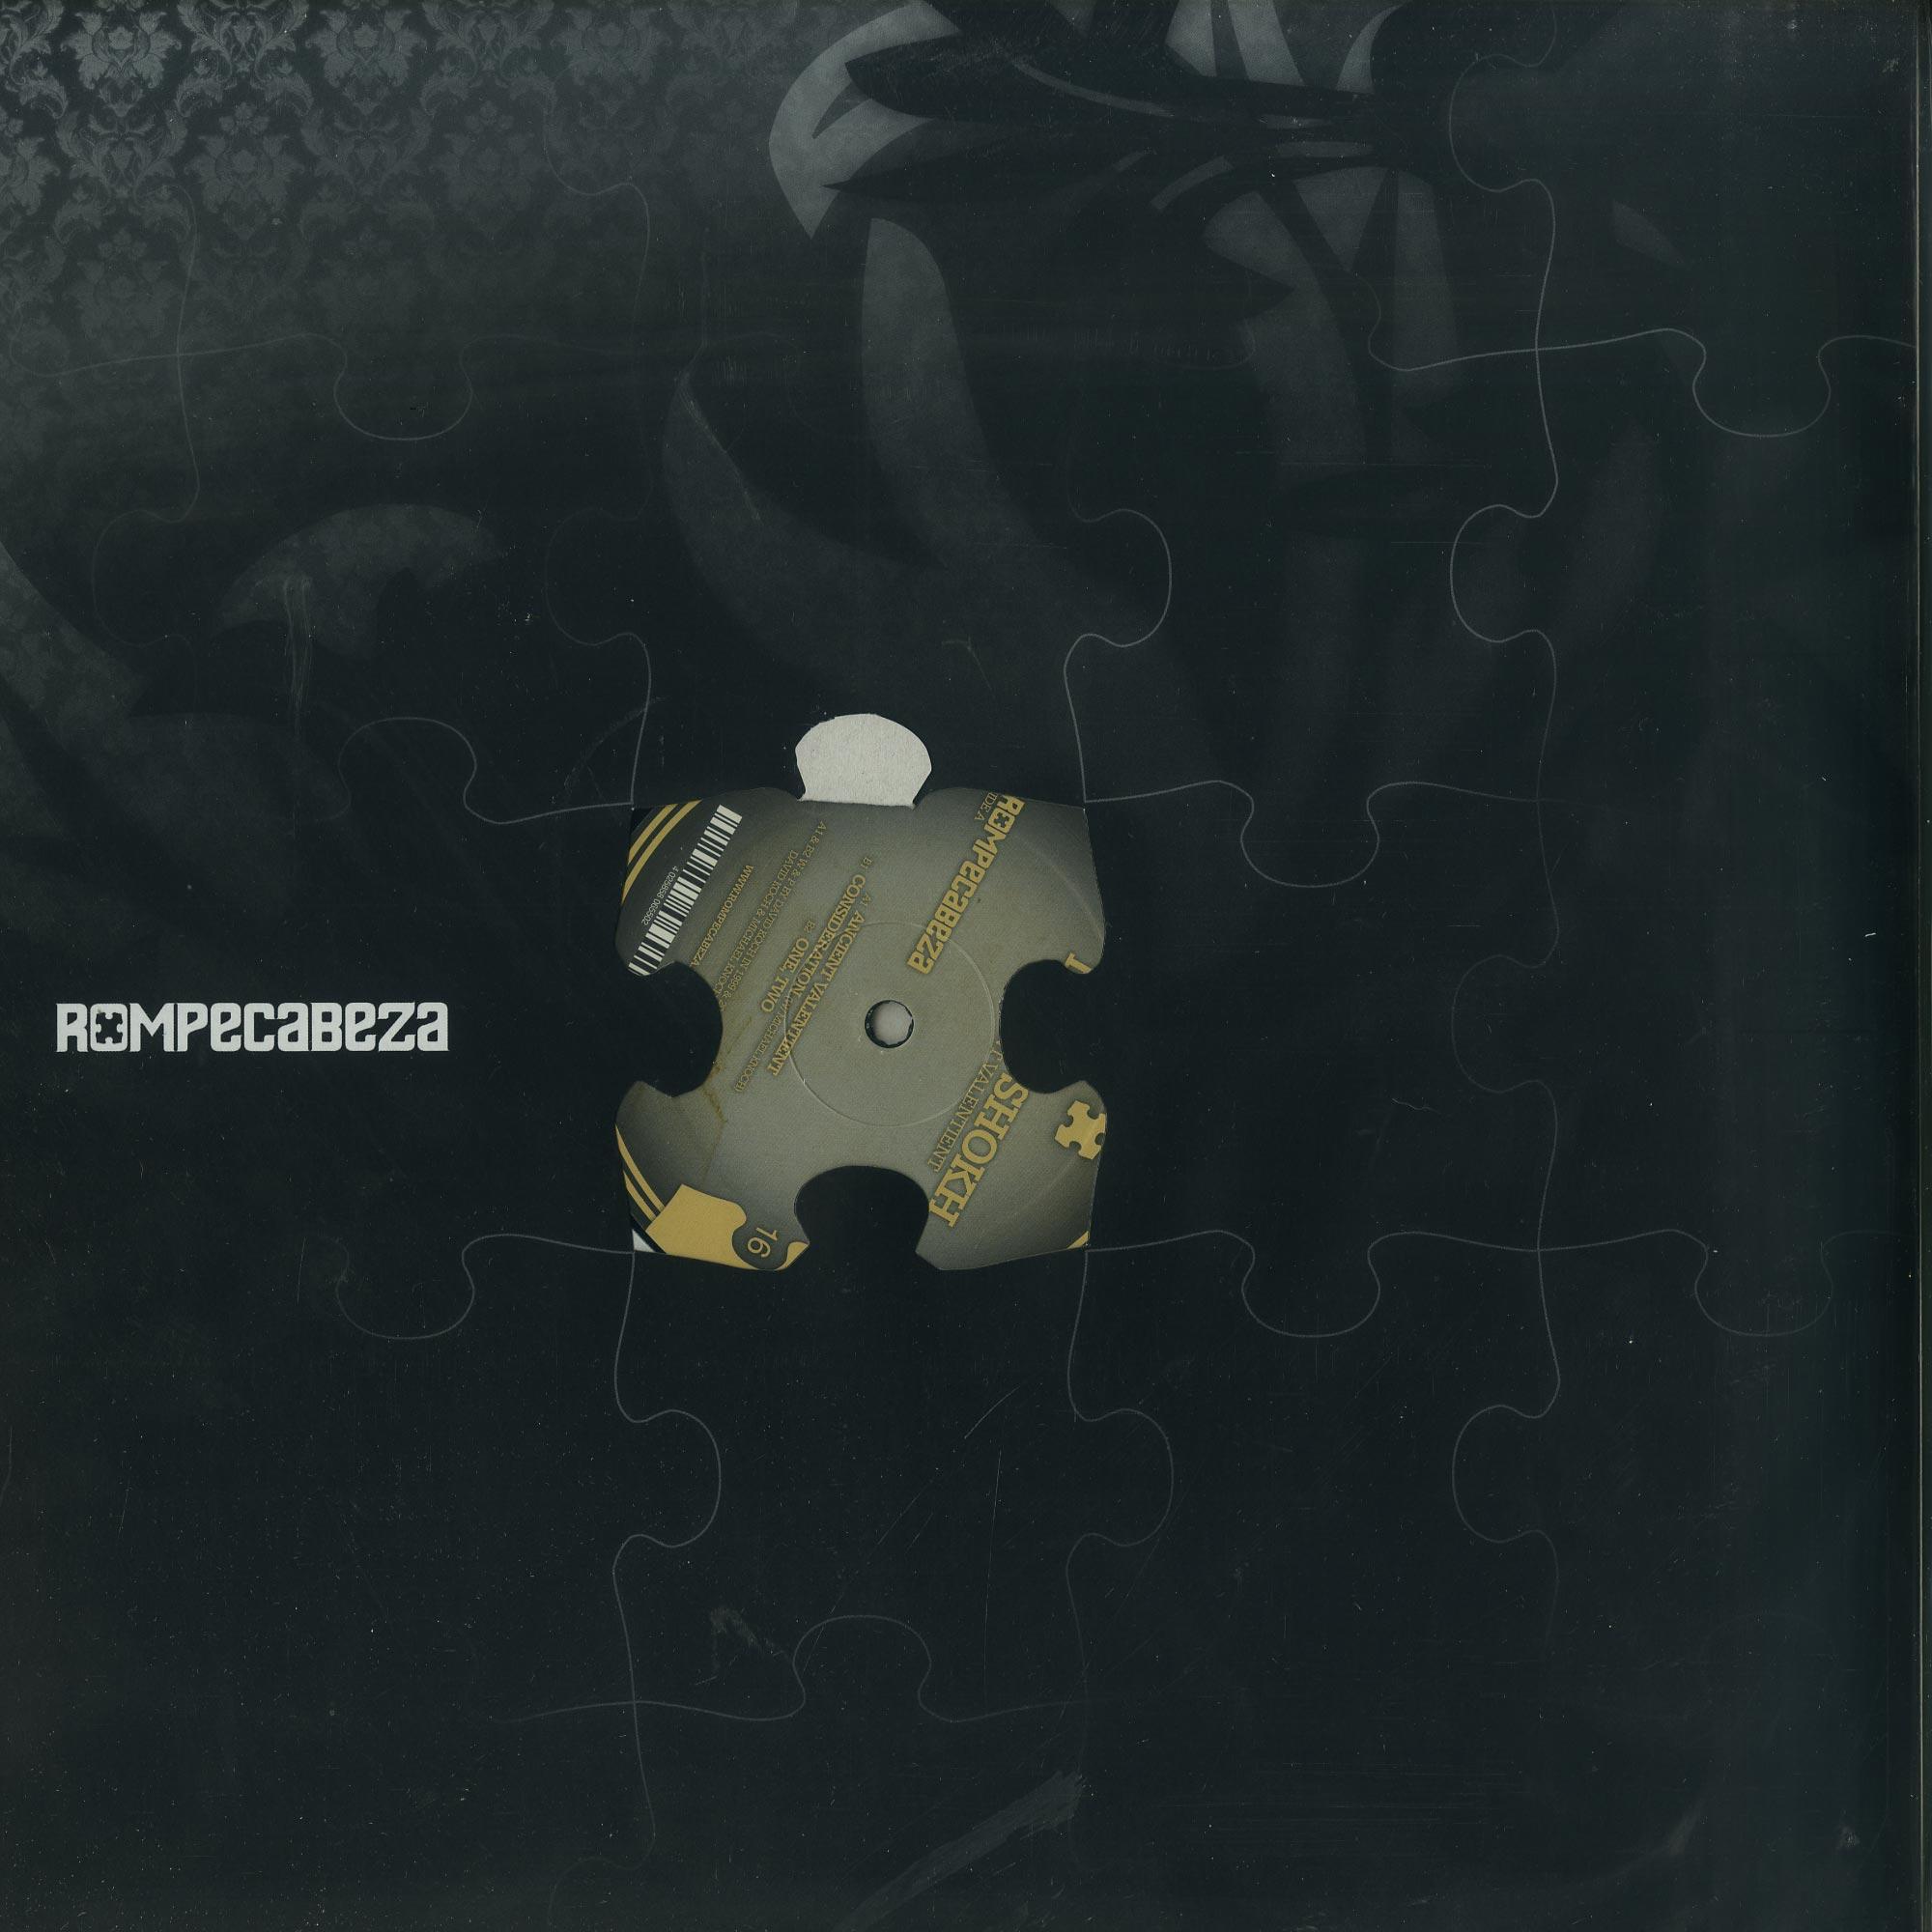 Rompecabeza - SPECIAL PACK 02